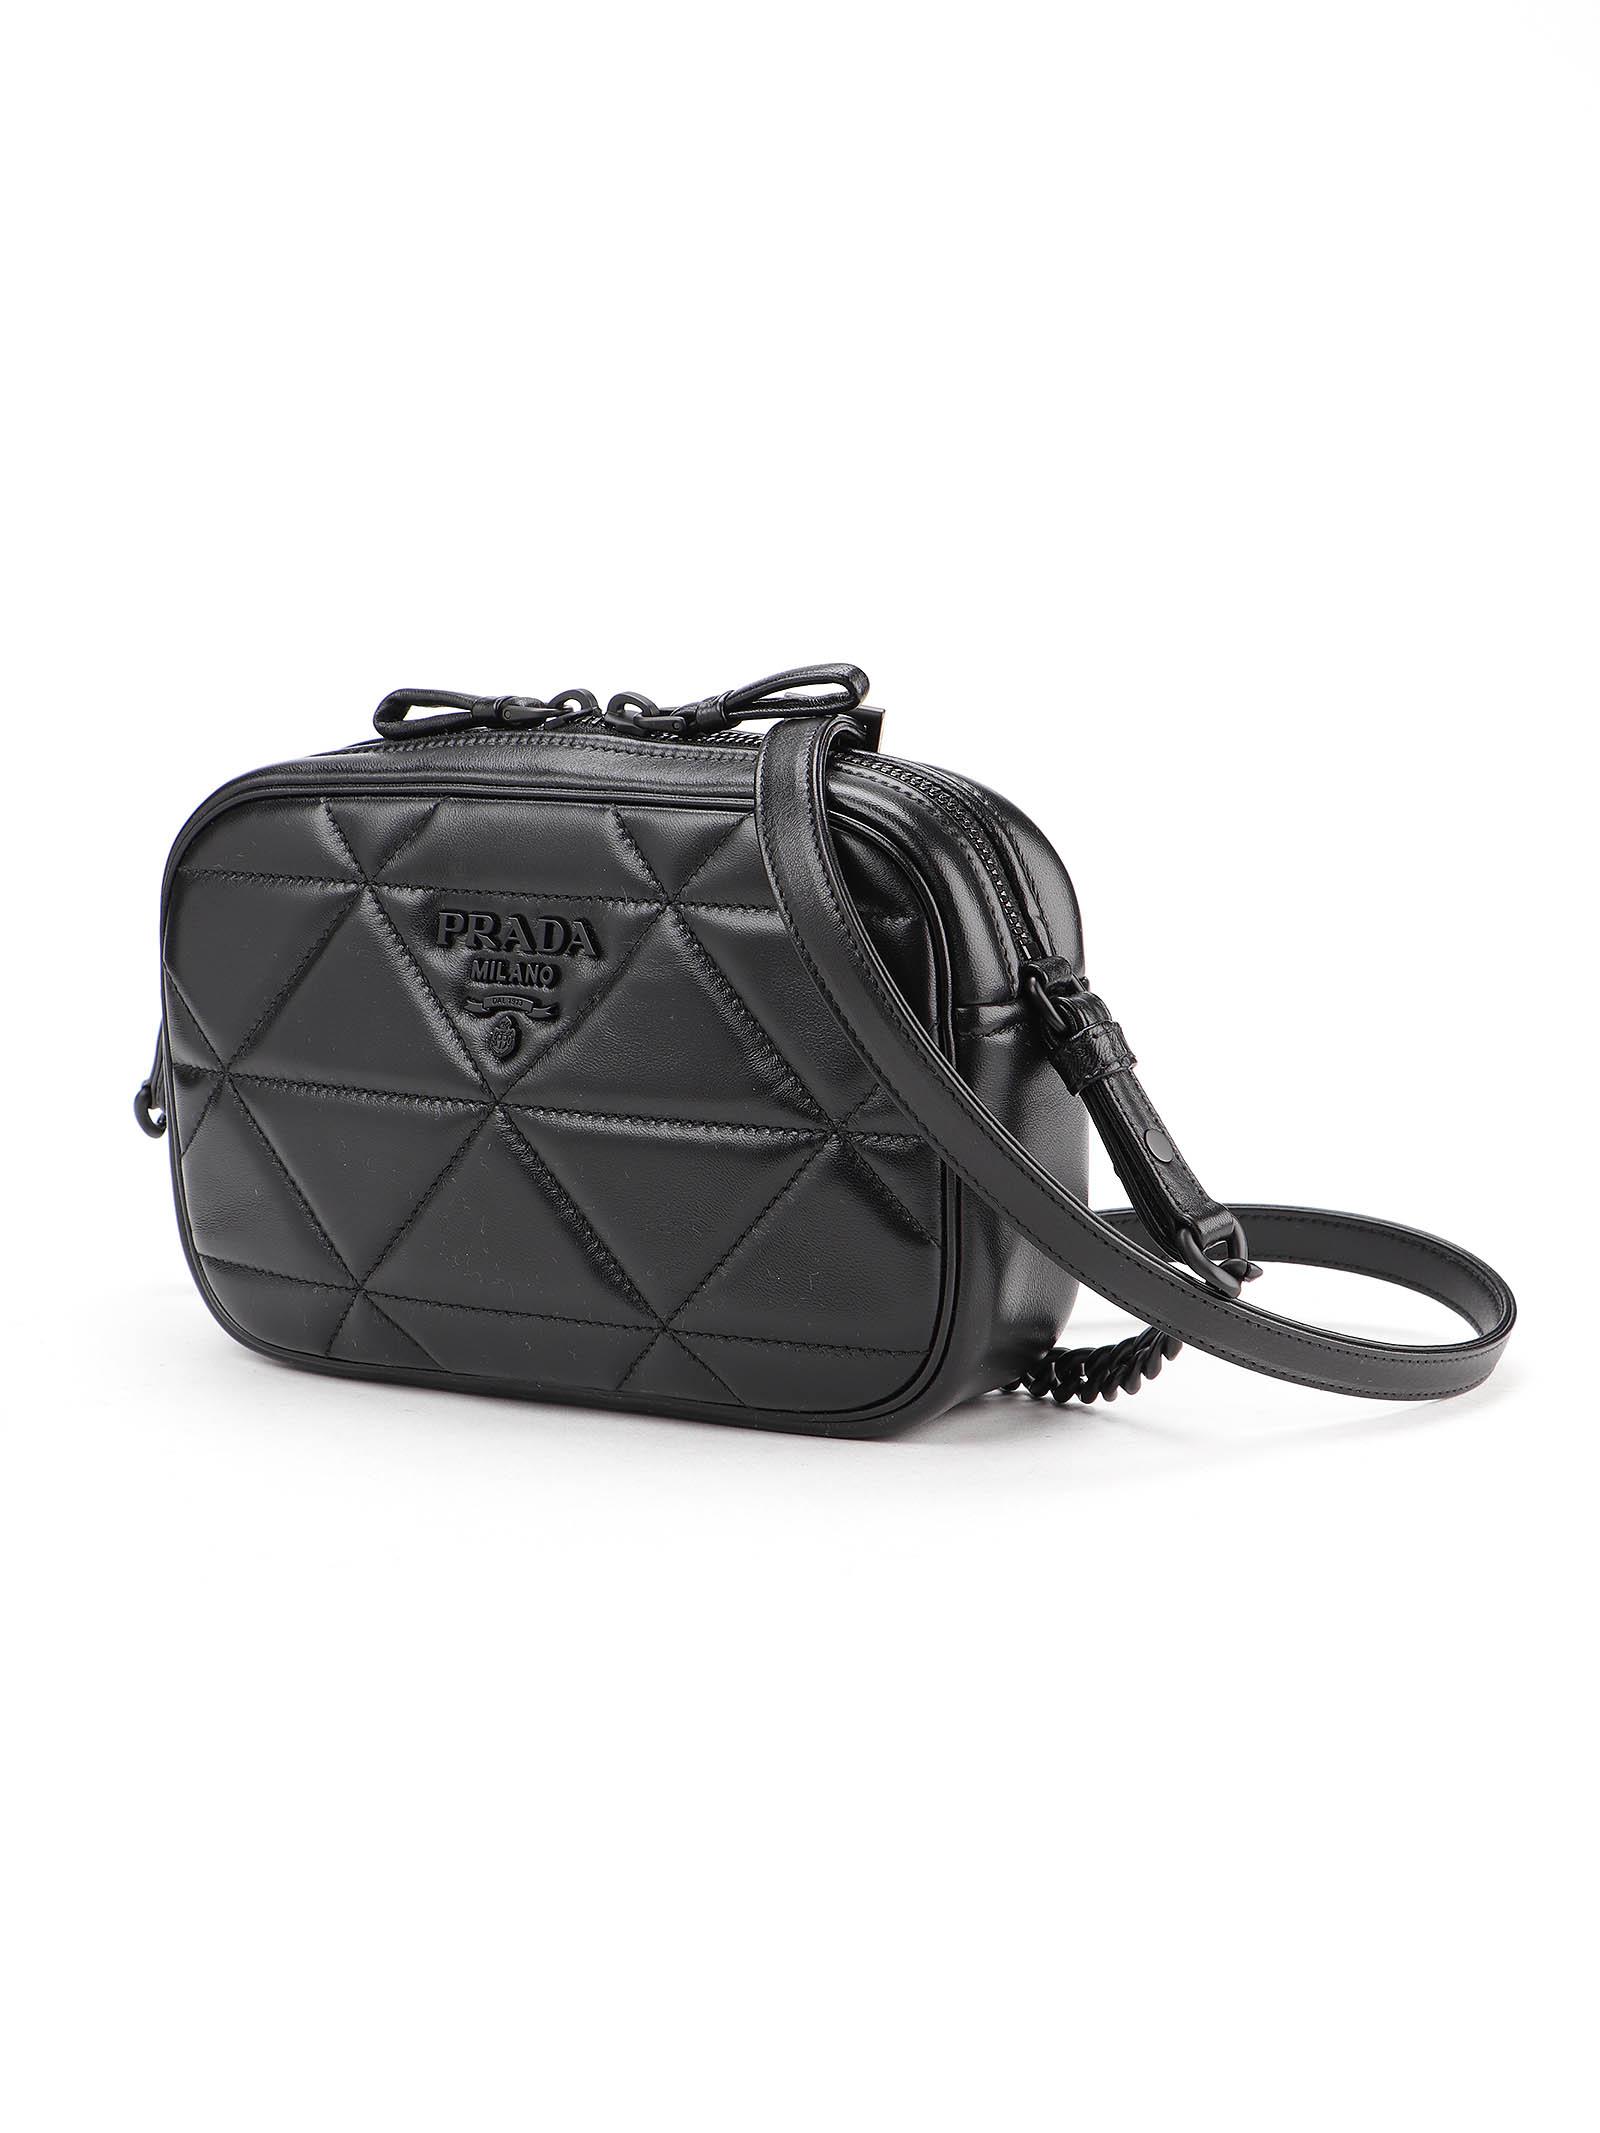 Immagine di Prada   Prada Spectrum Shoulder Bag